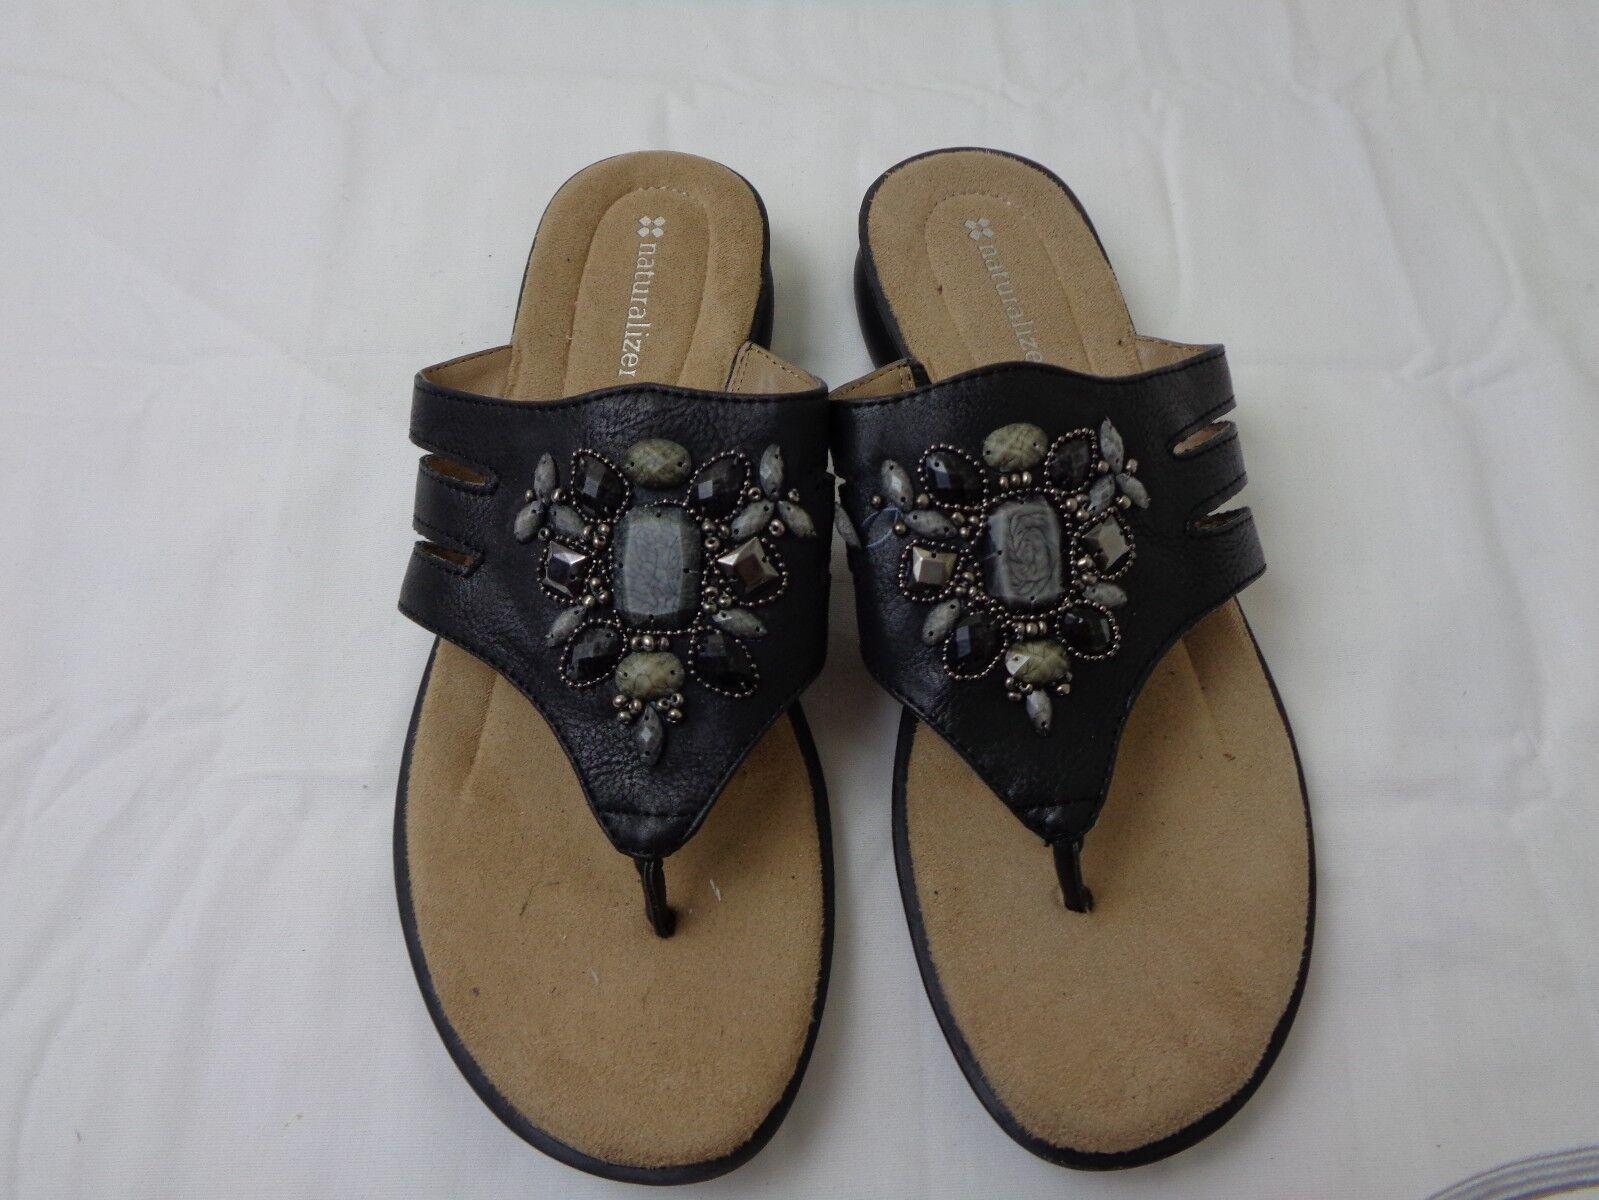 Vintage Naturalizer Black Thong Sandals Women's Size 7.5W